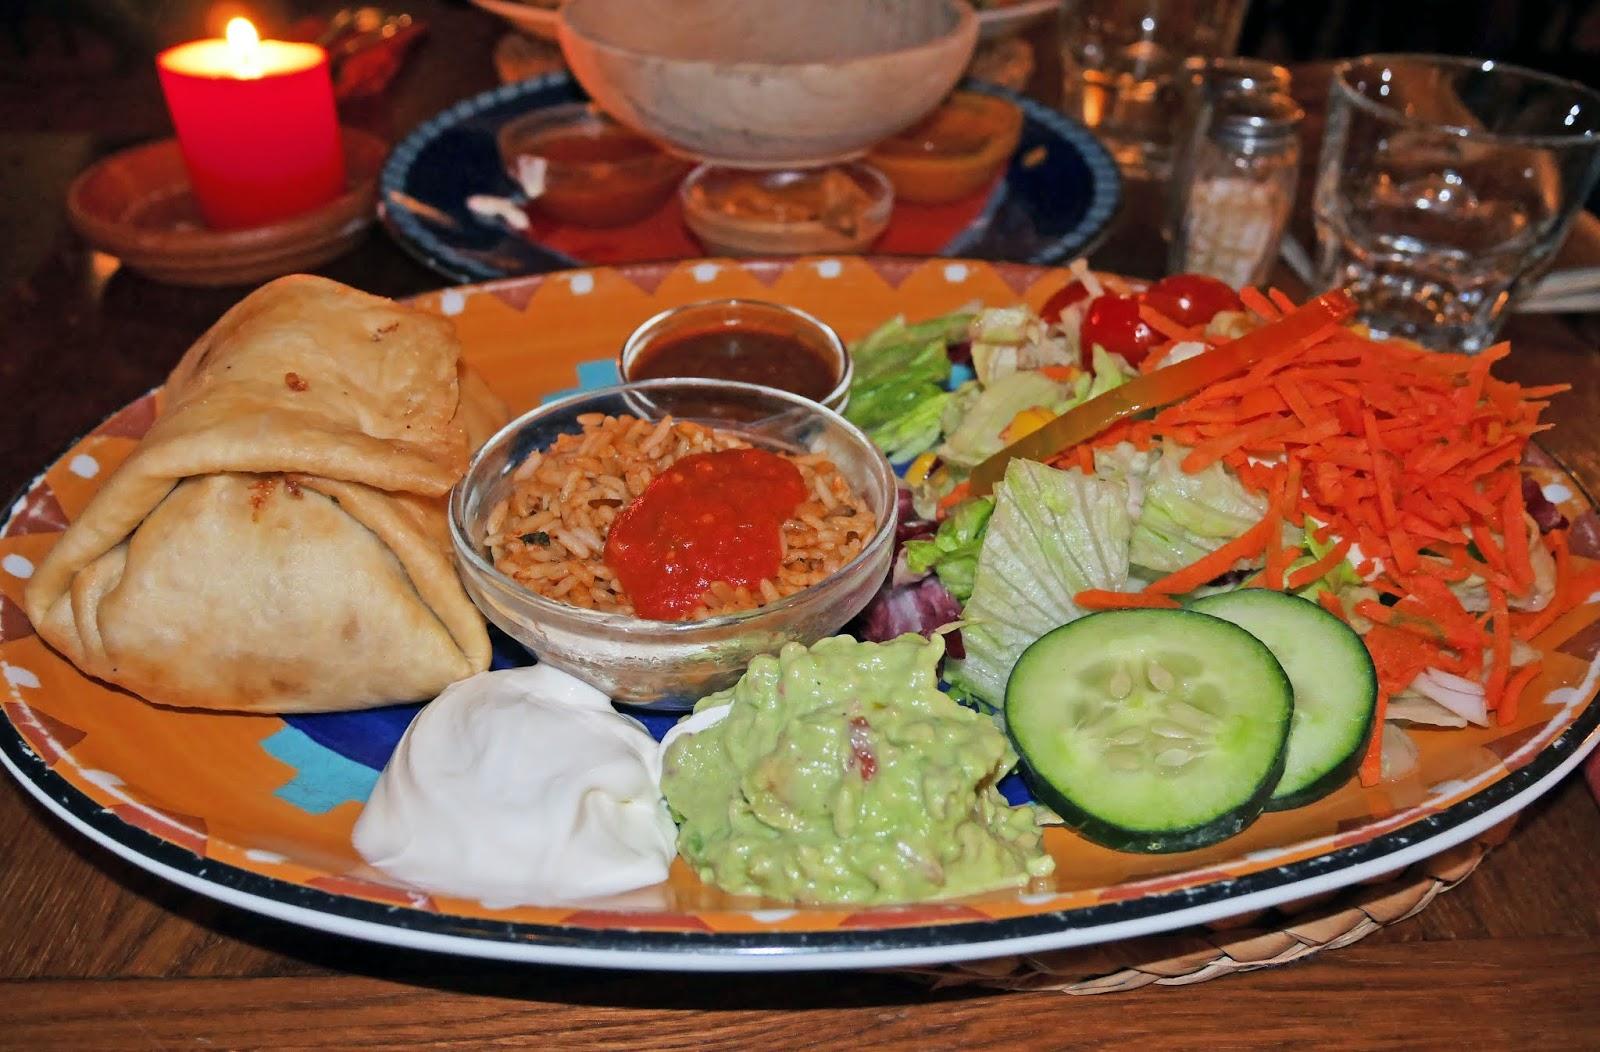 Vegetarian enchiladas at Joe Peña in Ljubljana, Slovenia